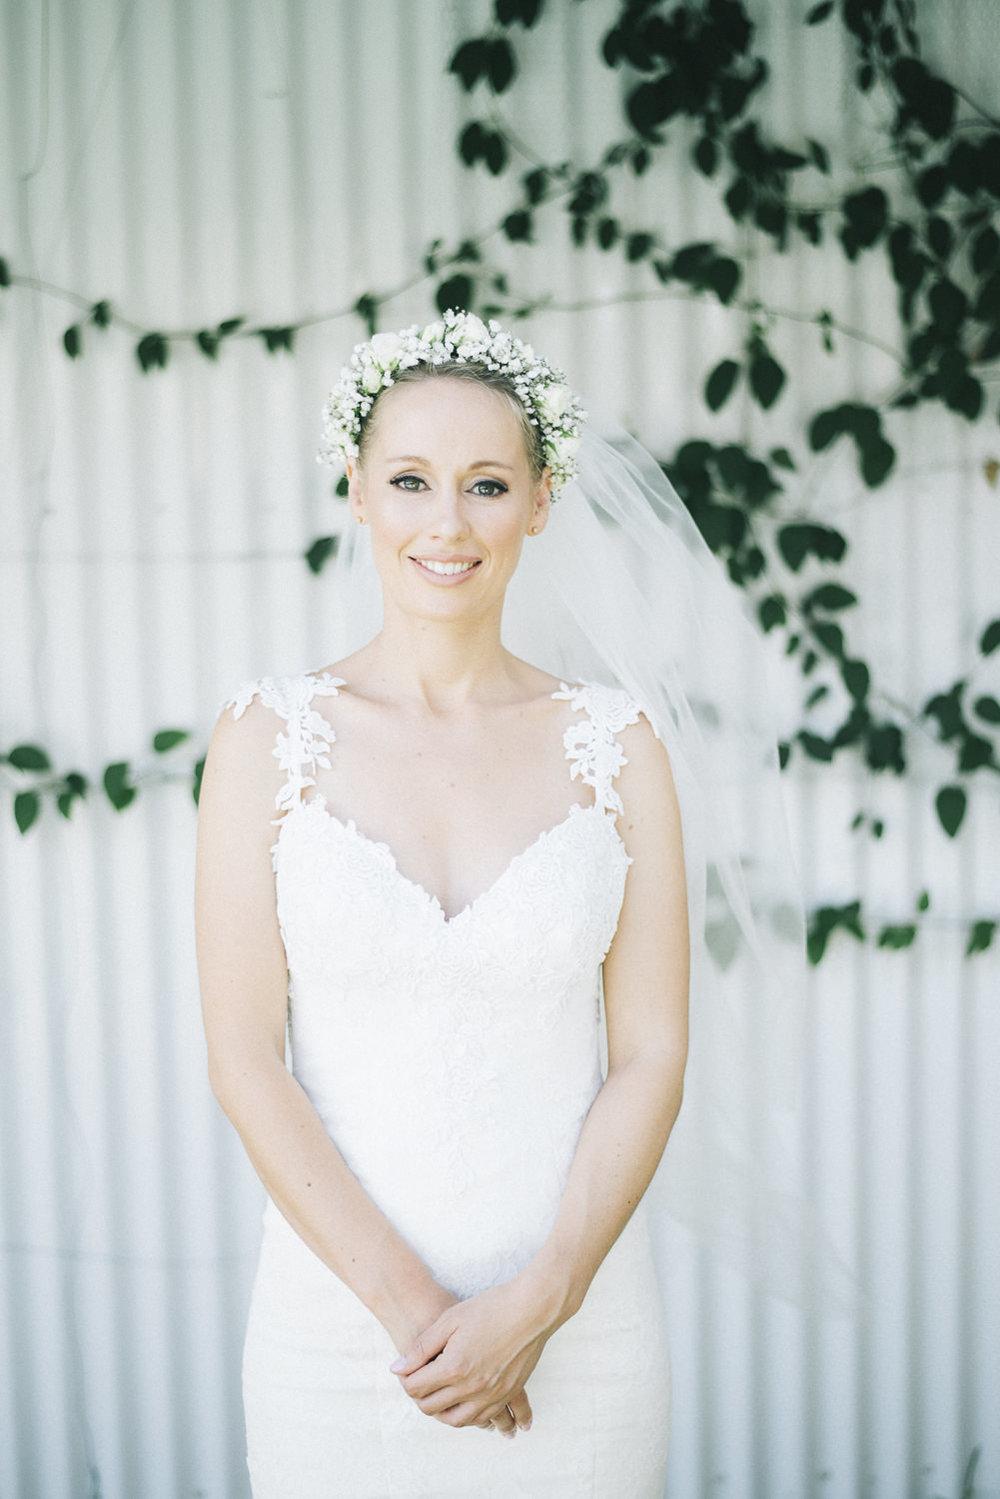 Ryan-sarah-jfk-wood-fire-gold-coast-wedding-42.jpg